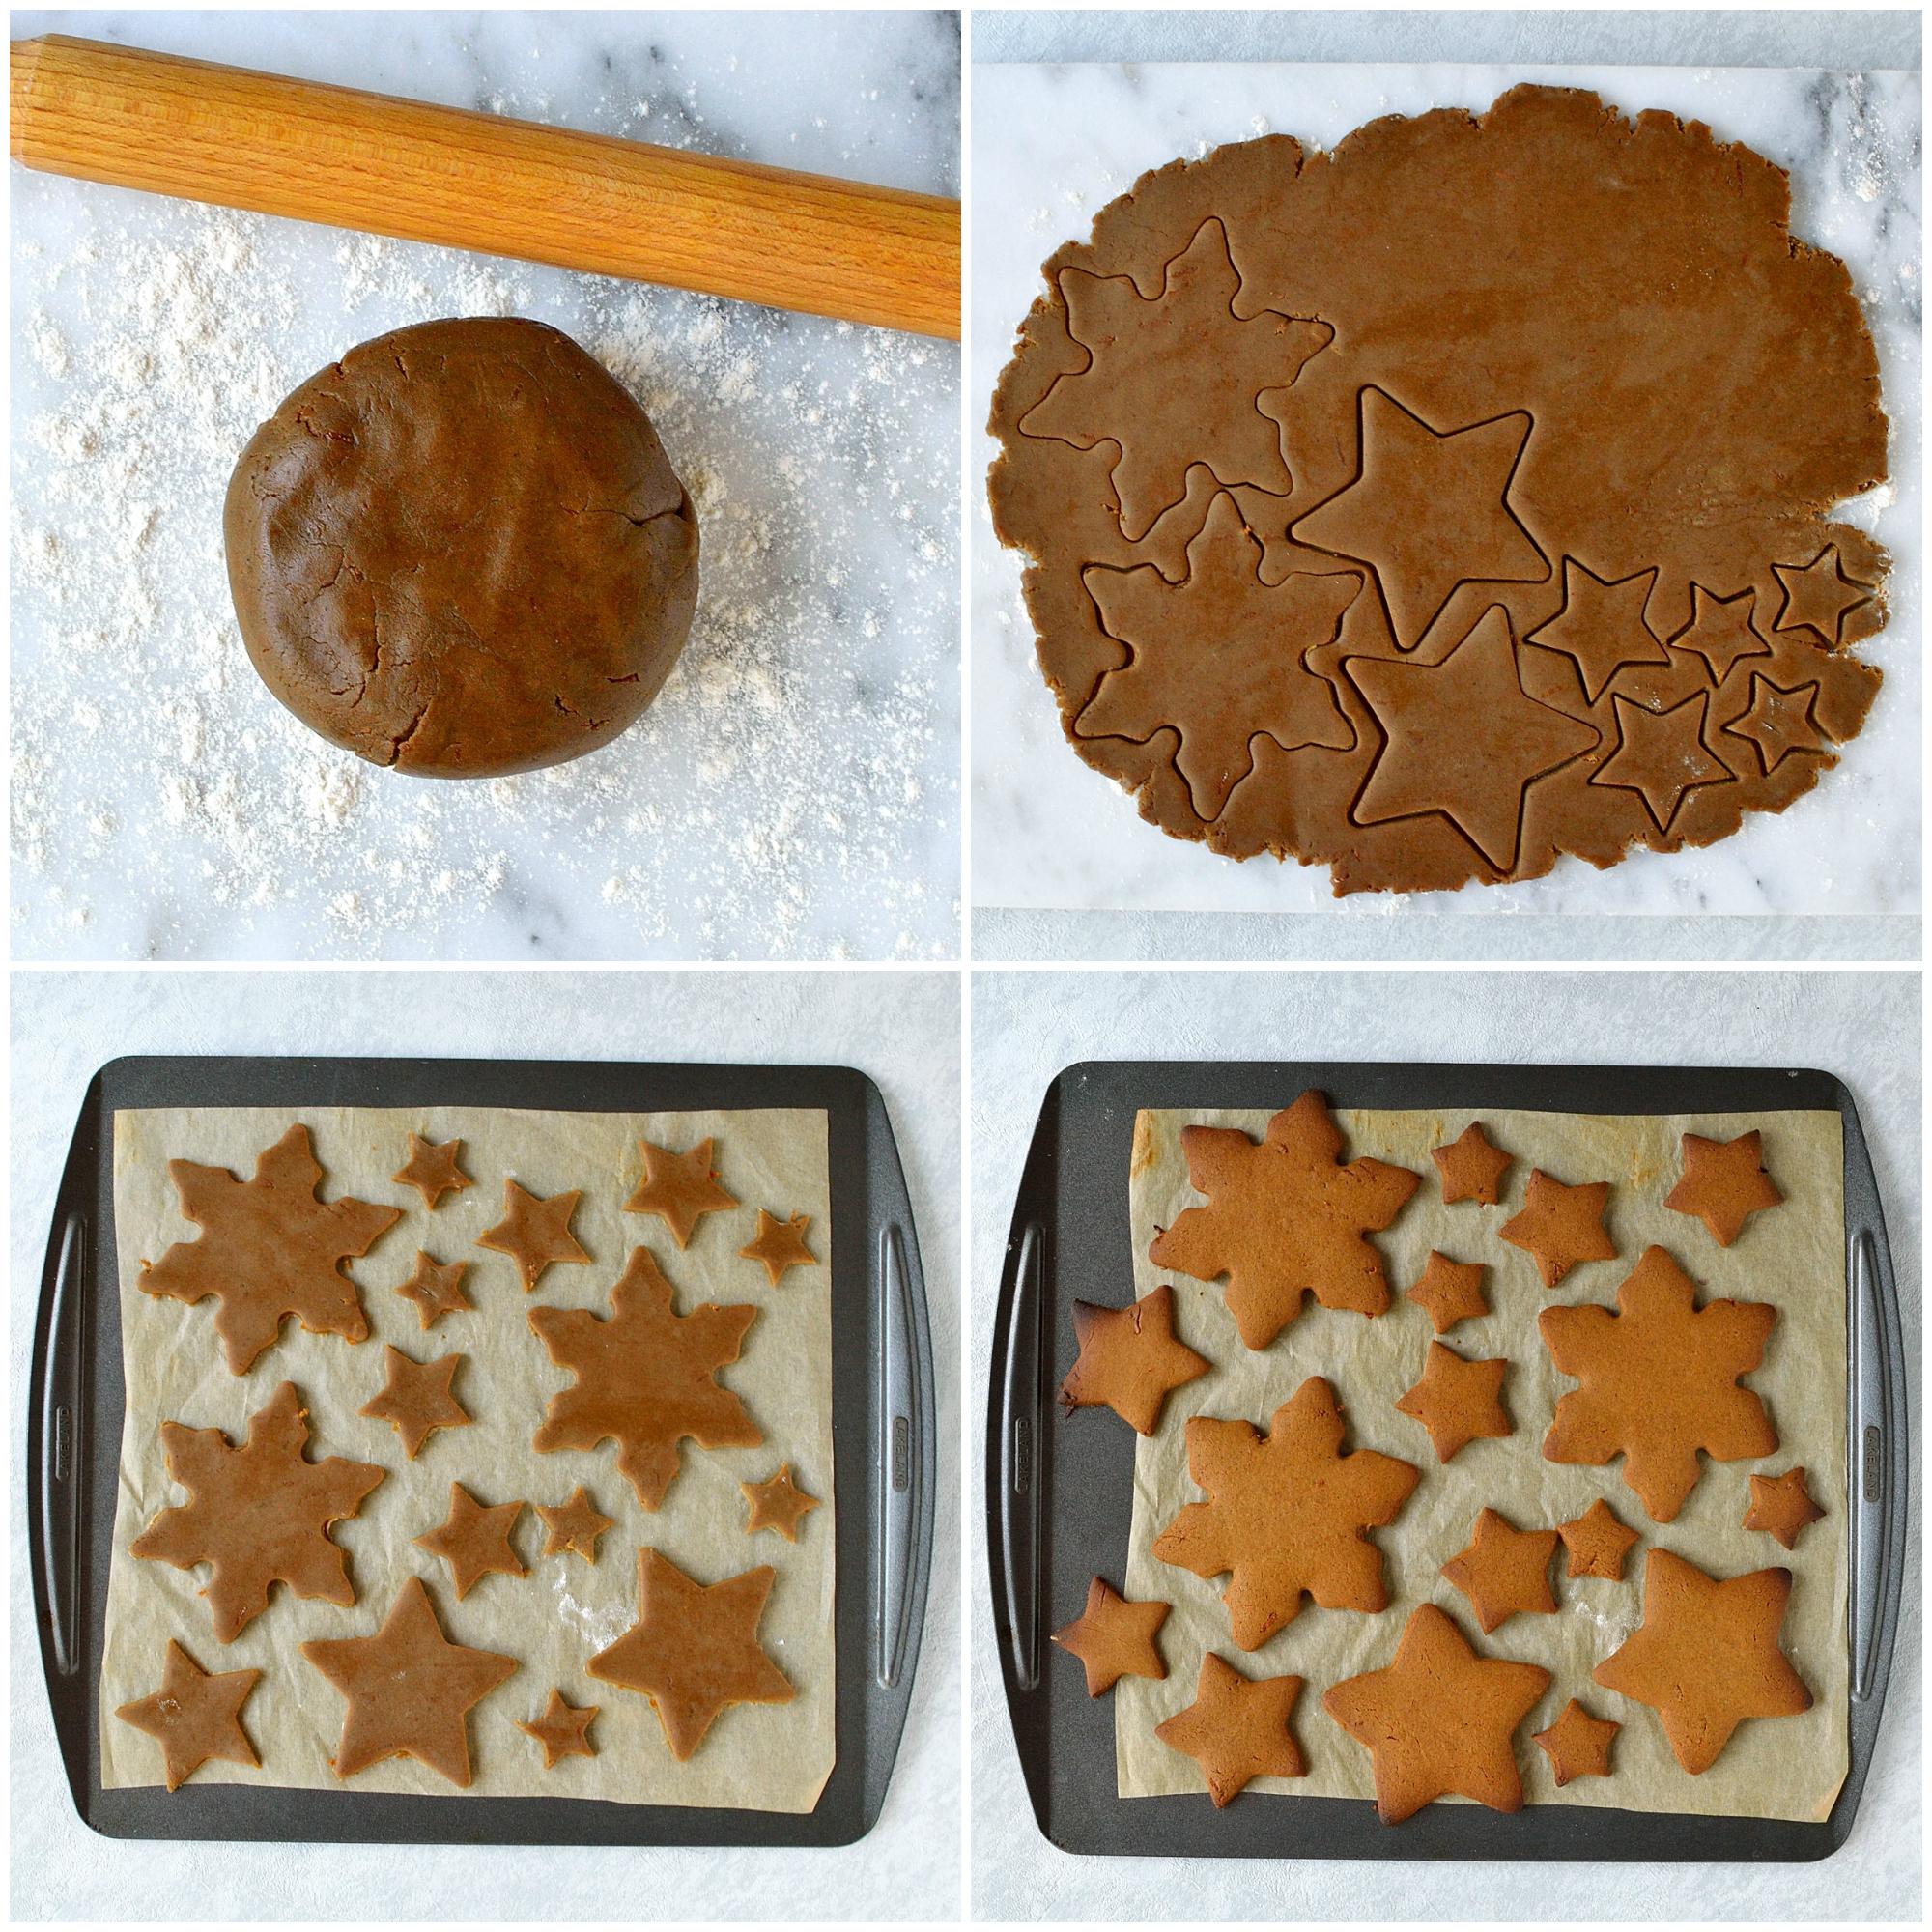 Gingerbread steps 2